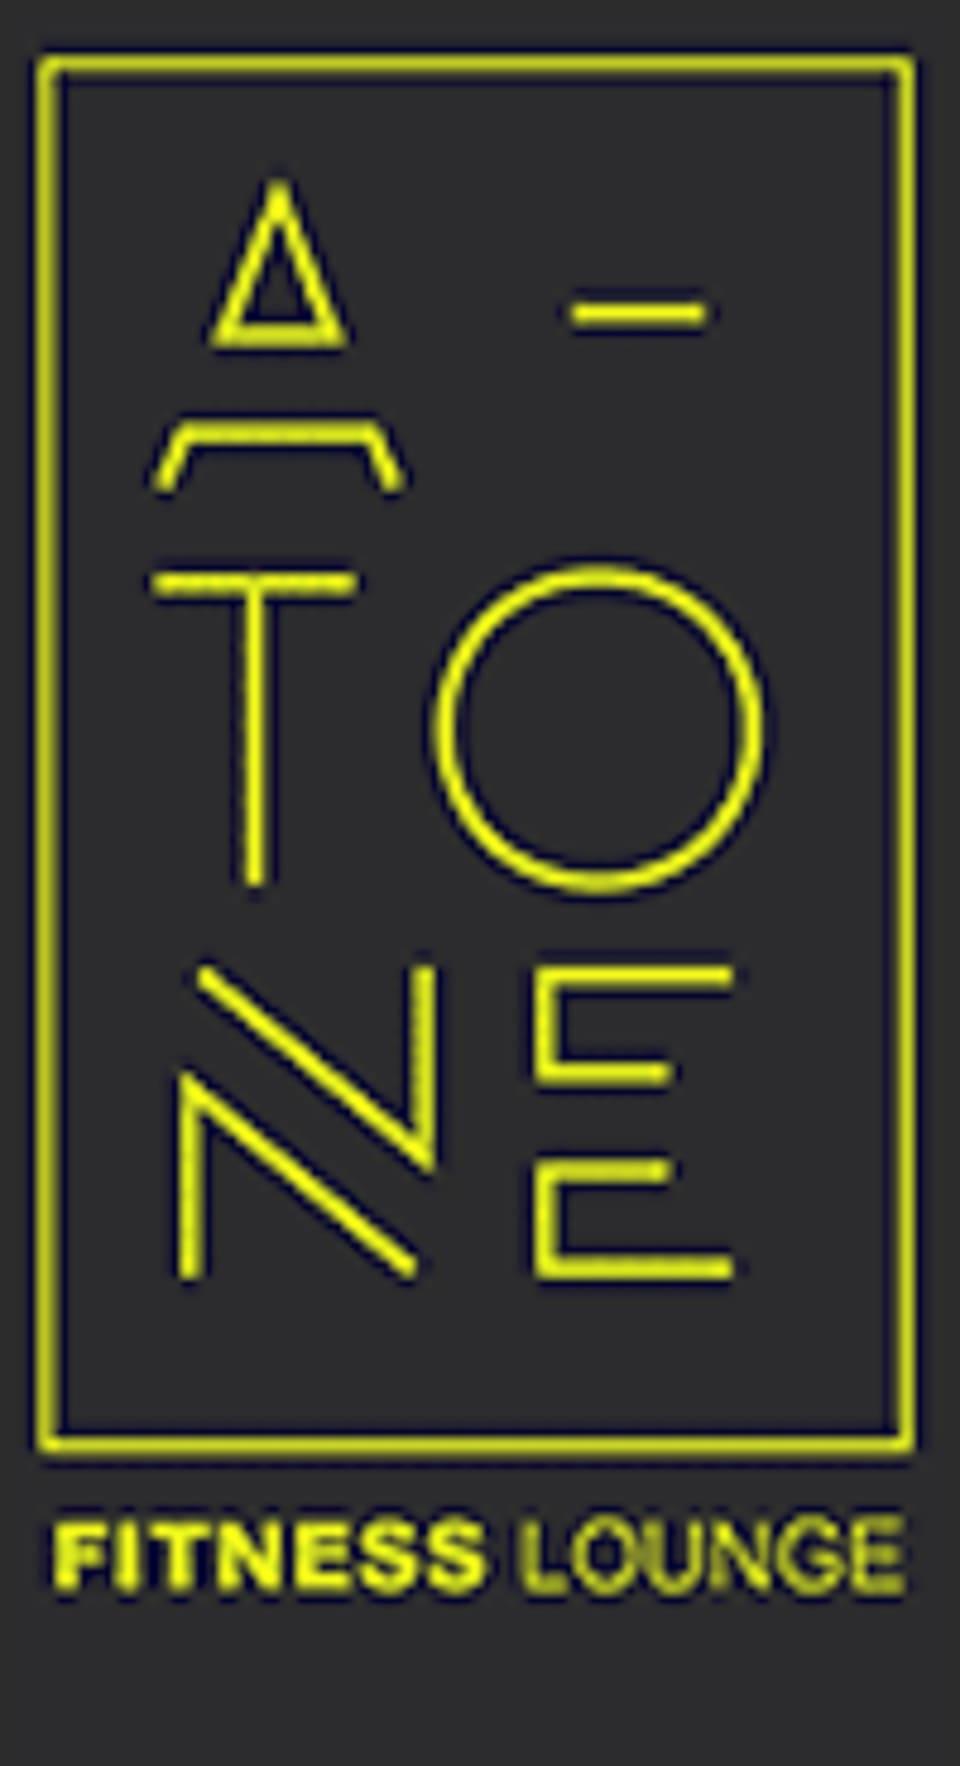 A-Tone Fitness Lounge logo